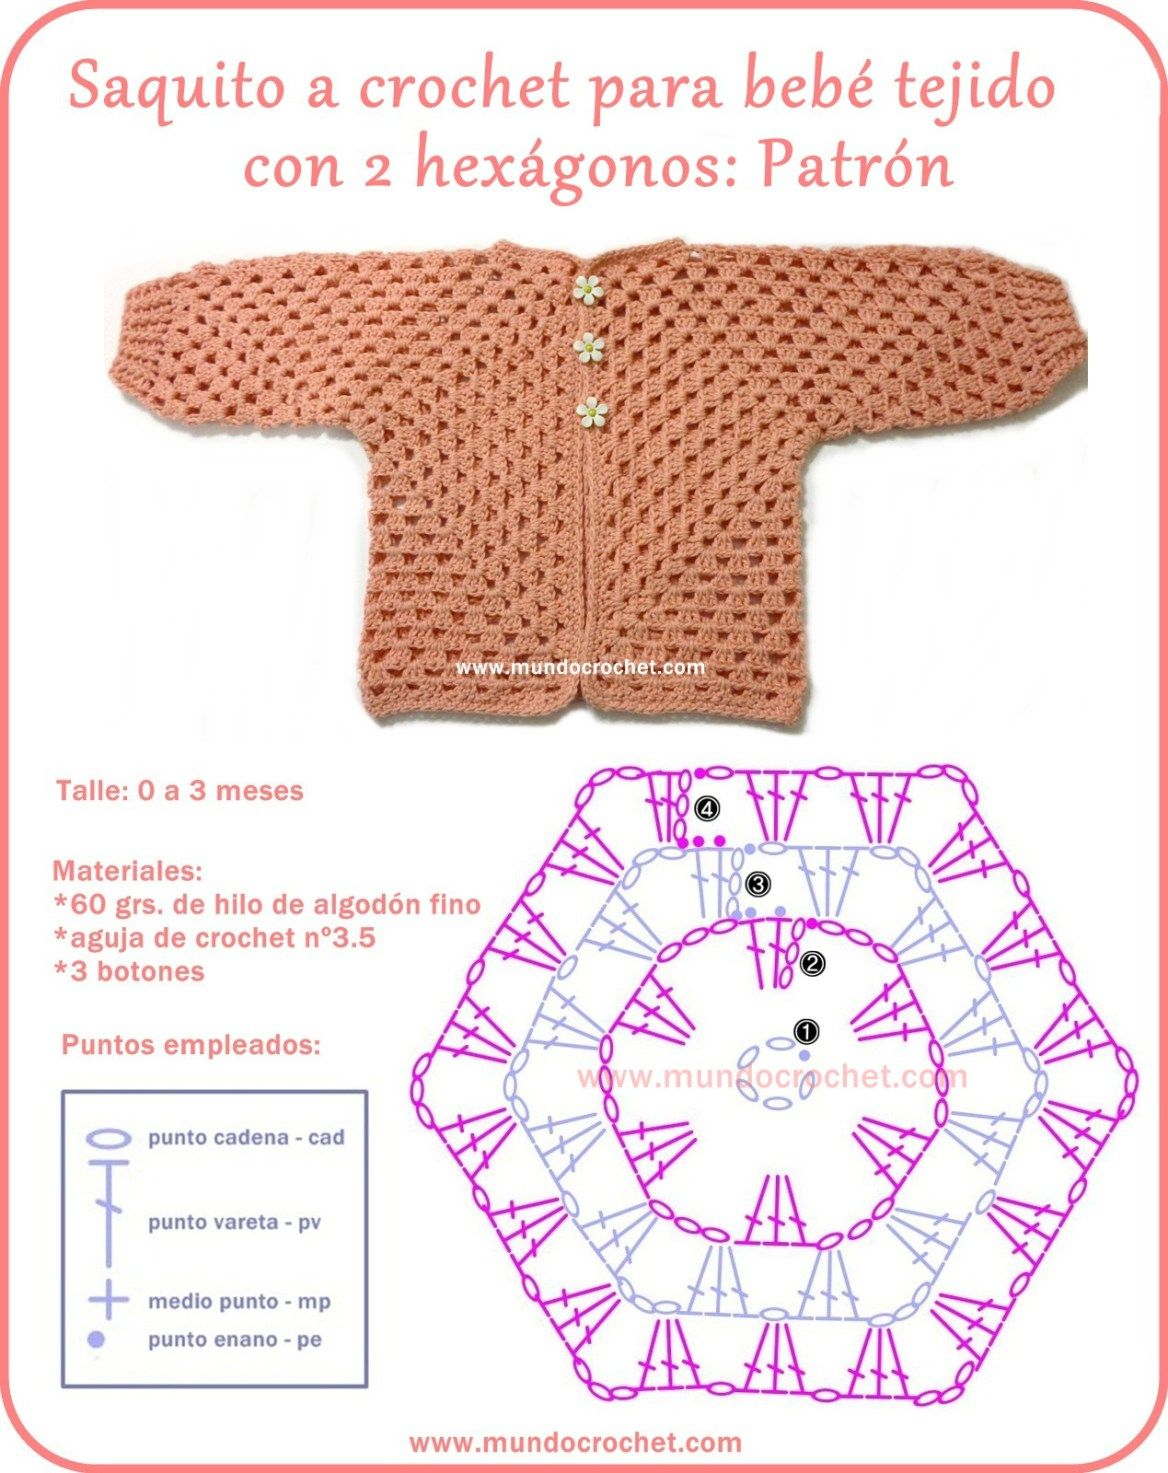 Patron Campera O Saquito Tejida Con 2 Hexagonos A Crochet Doily Diagram Patrones Patterns Pin Ganchillo Paso Tutorial01